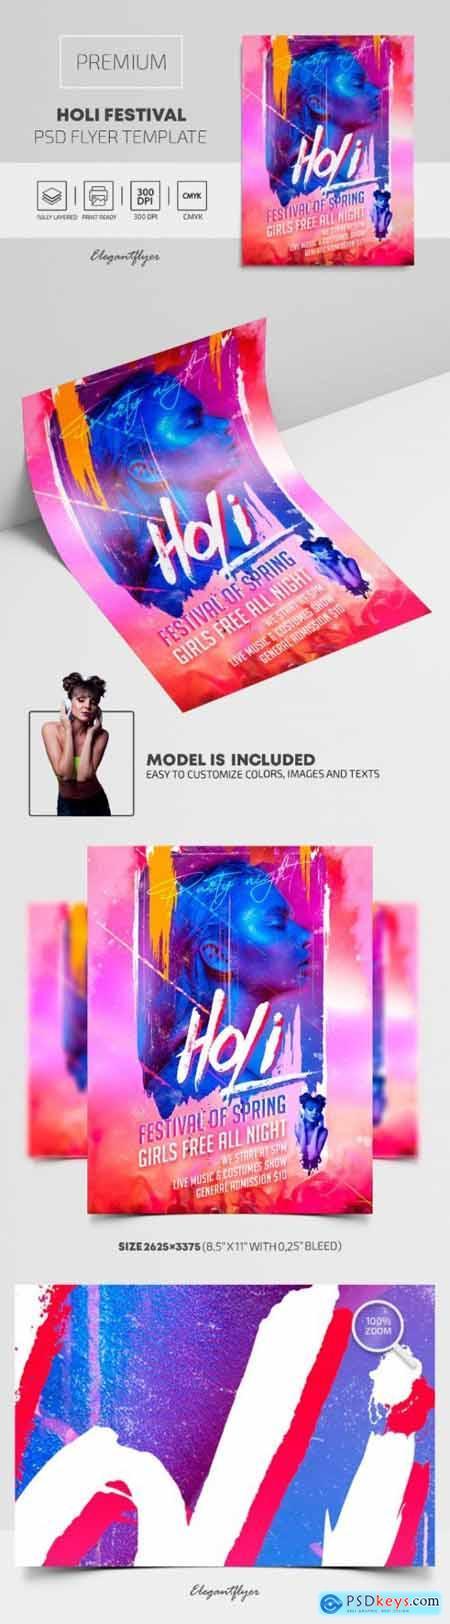 Holi Festival – Premium PSD Flyer Template